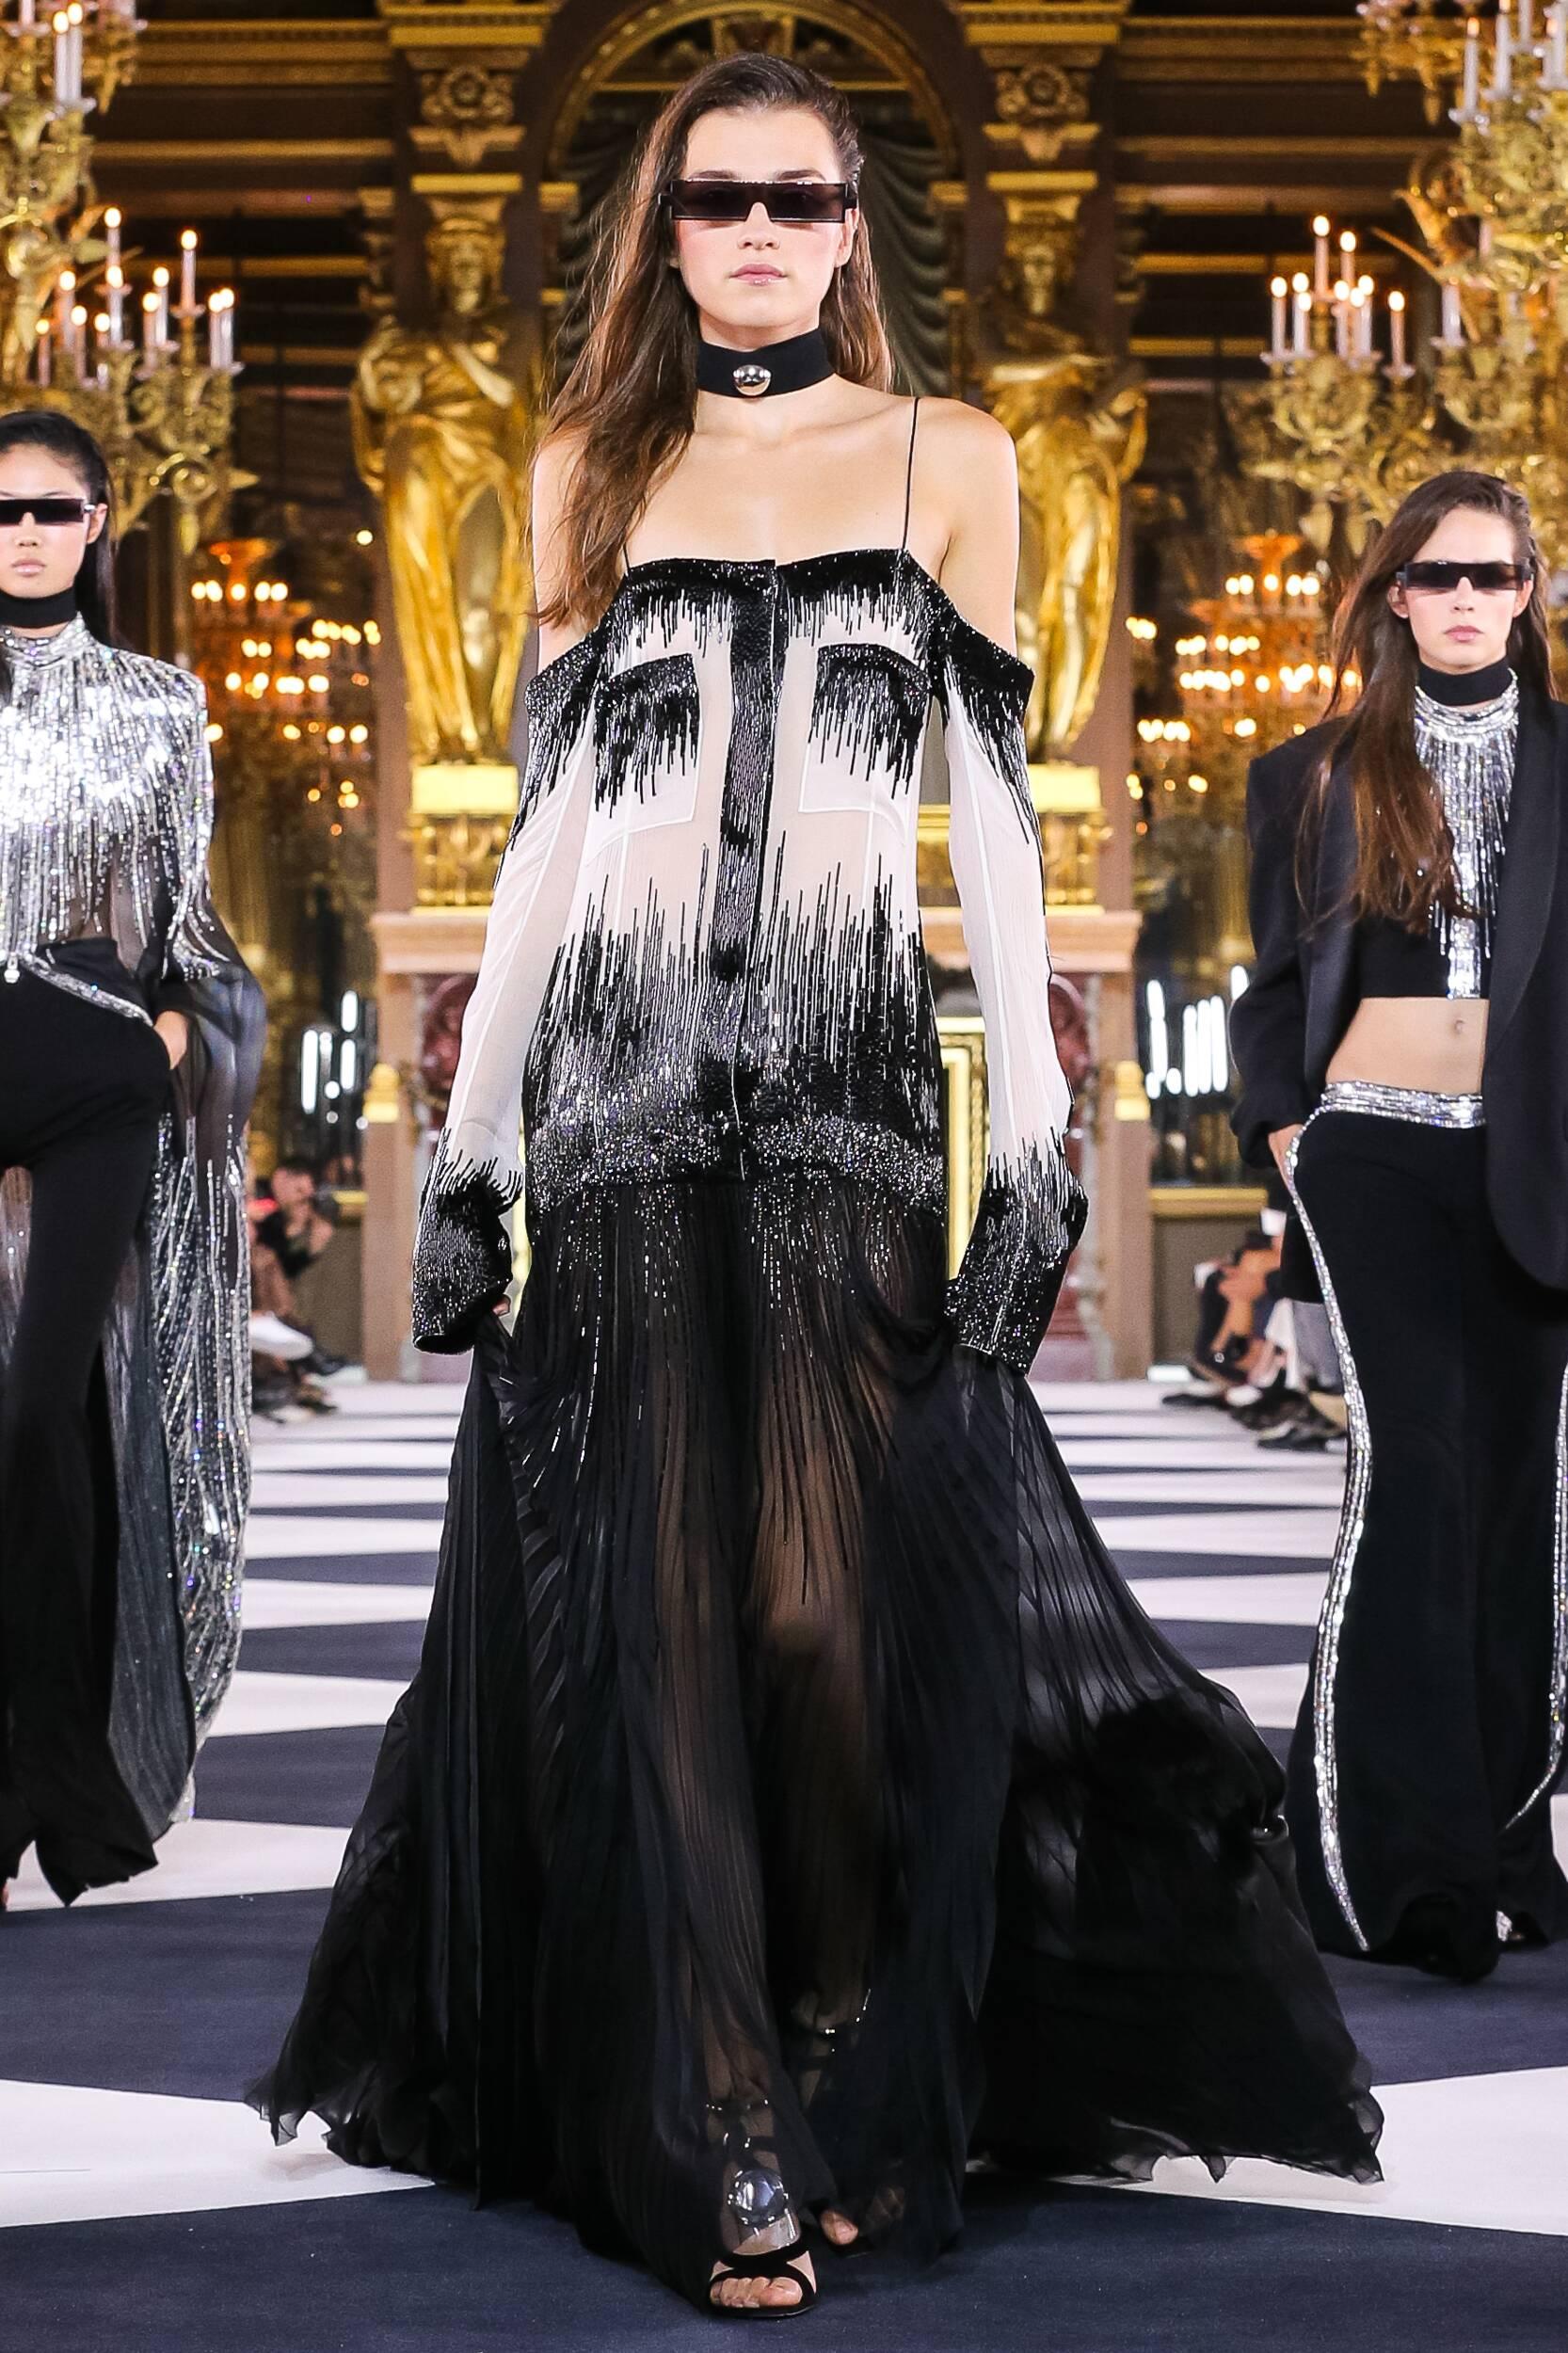 Fashion Trends 2020 Catwalk Balmain Summer Women's Collection